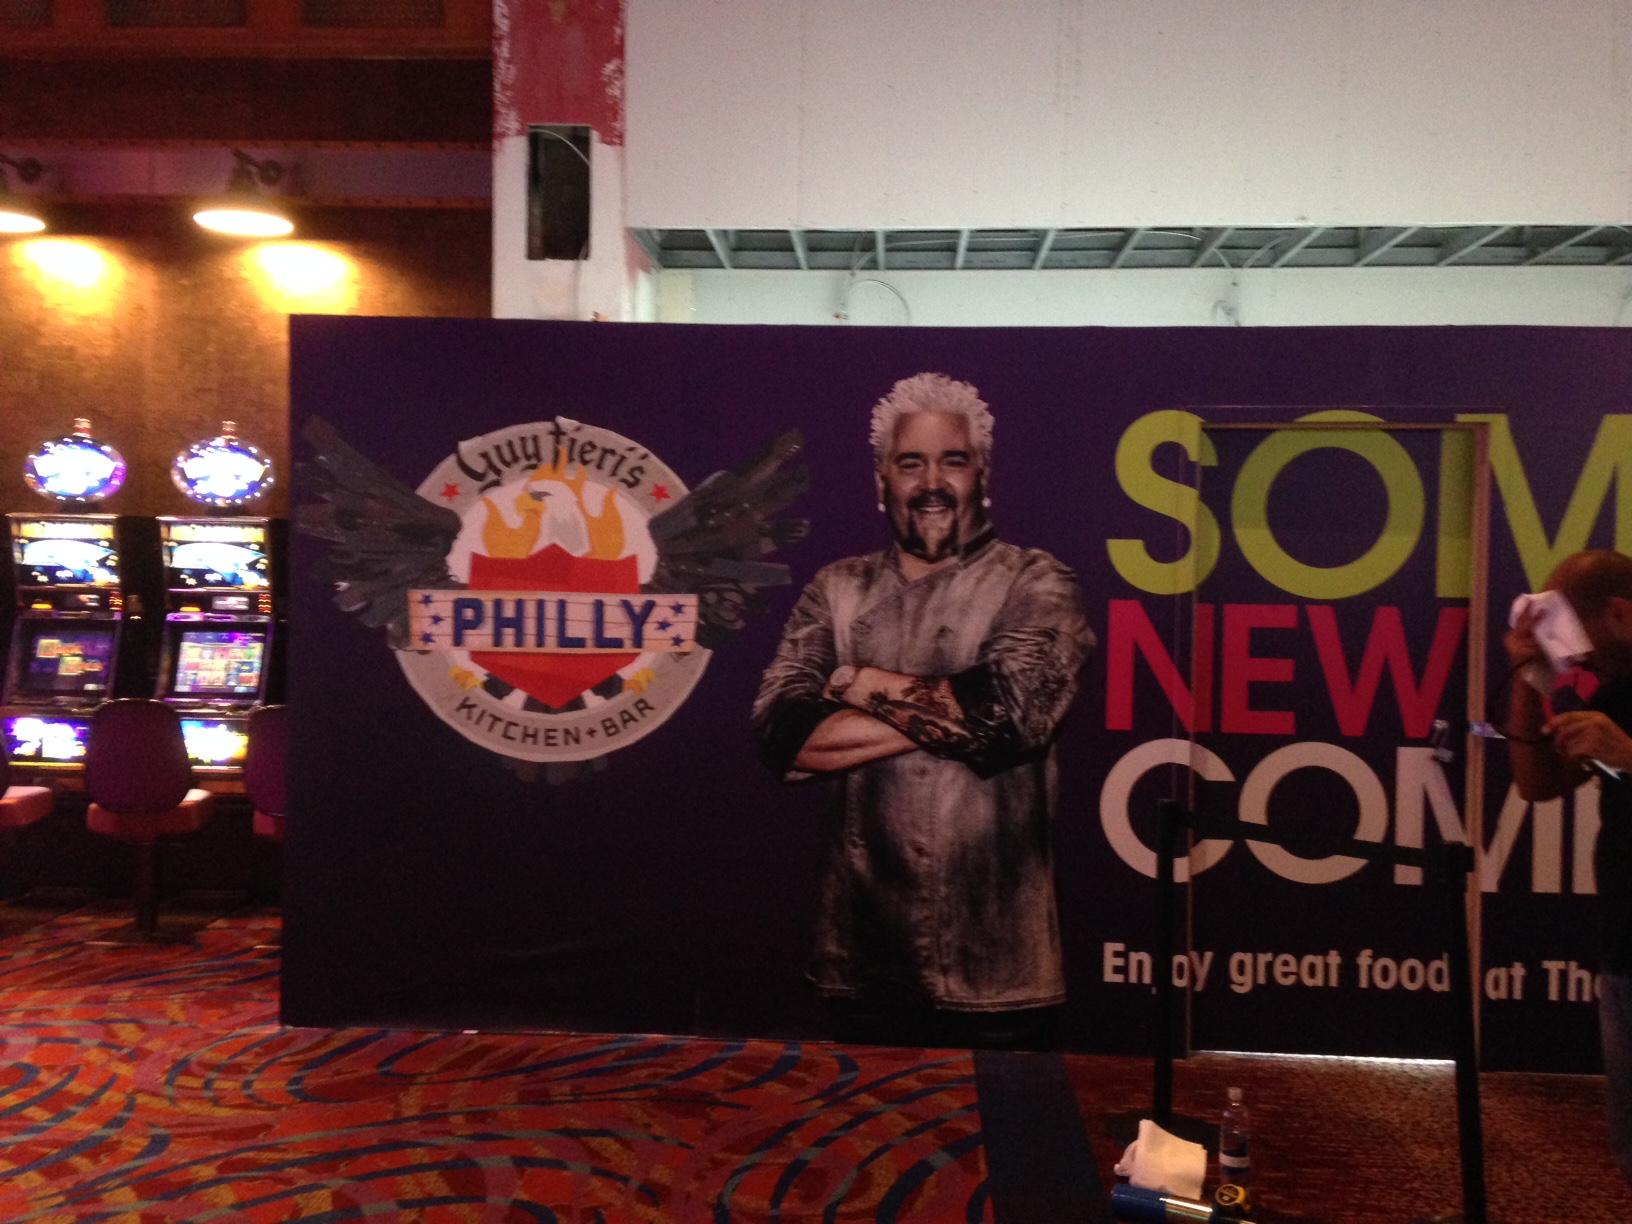 Guy Fieri wall graphics in casino